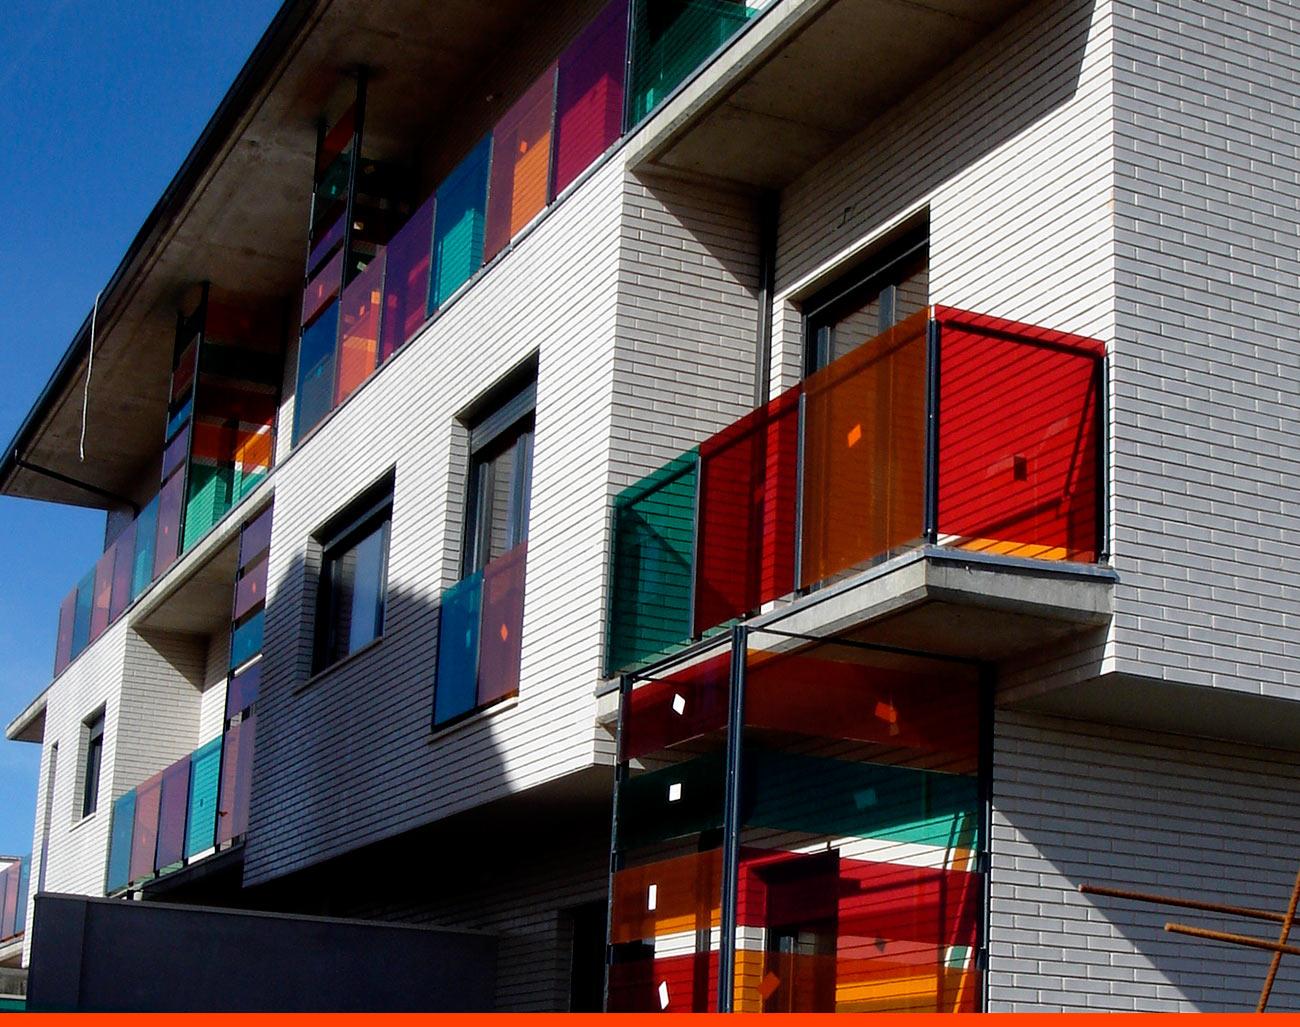 10 Viviendas en Avenida Libertad, Navatejera (León) para Projolis